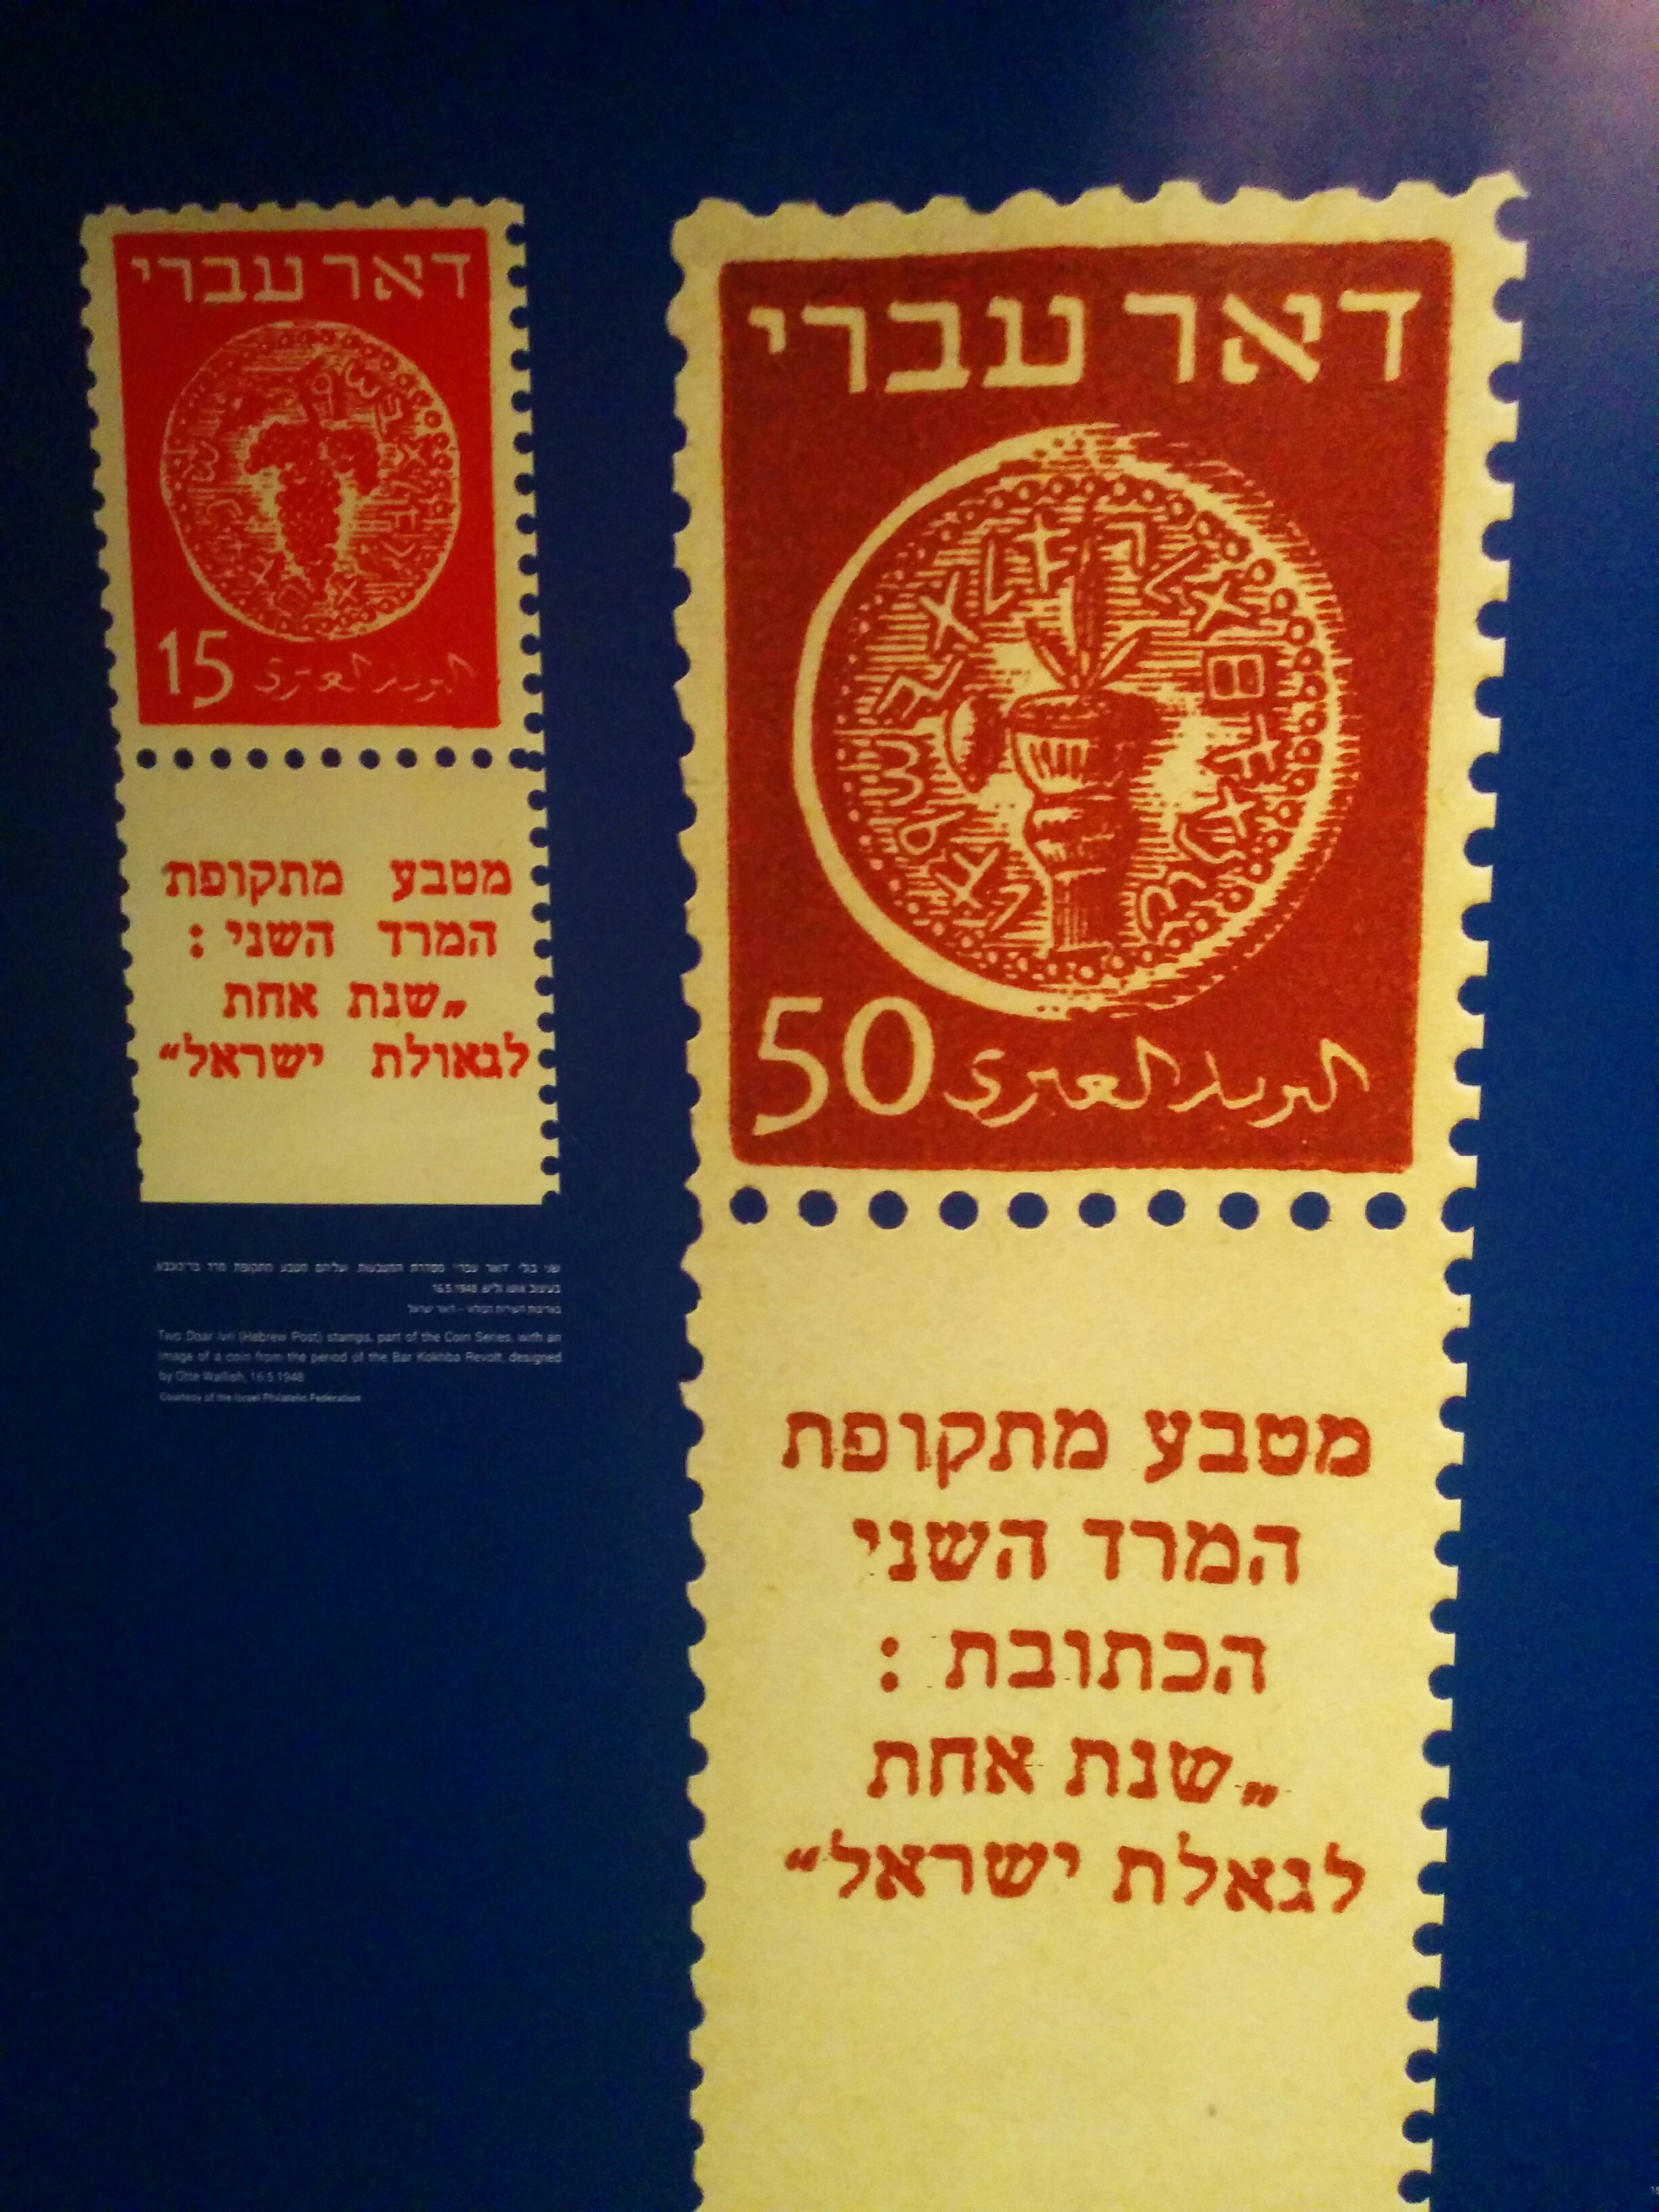 Bar Kokhba on first Israeli stamps - Shimon Bar Kokhba - Eretz Israel Museum